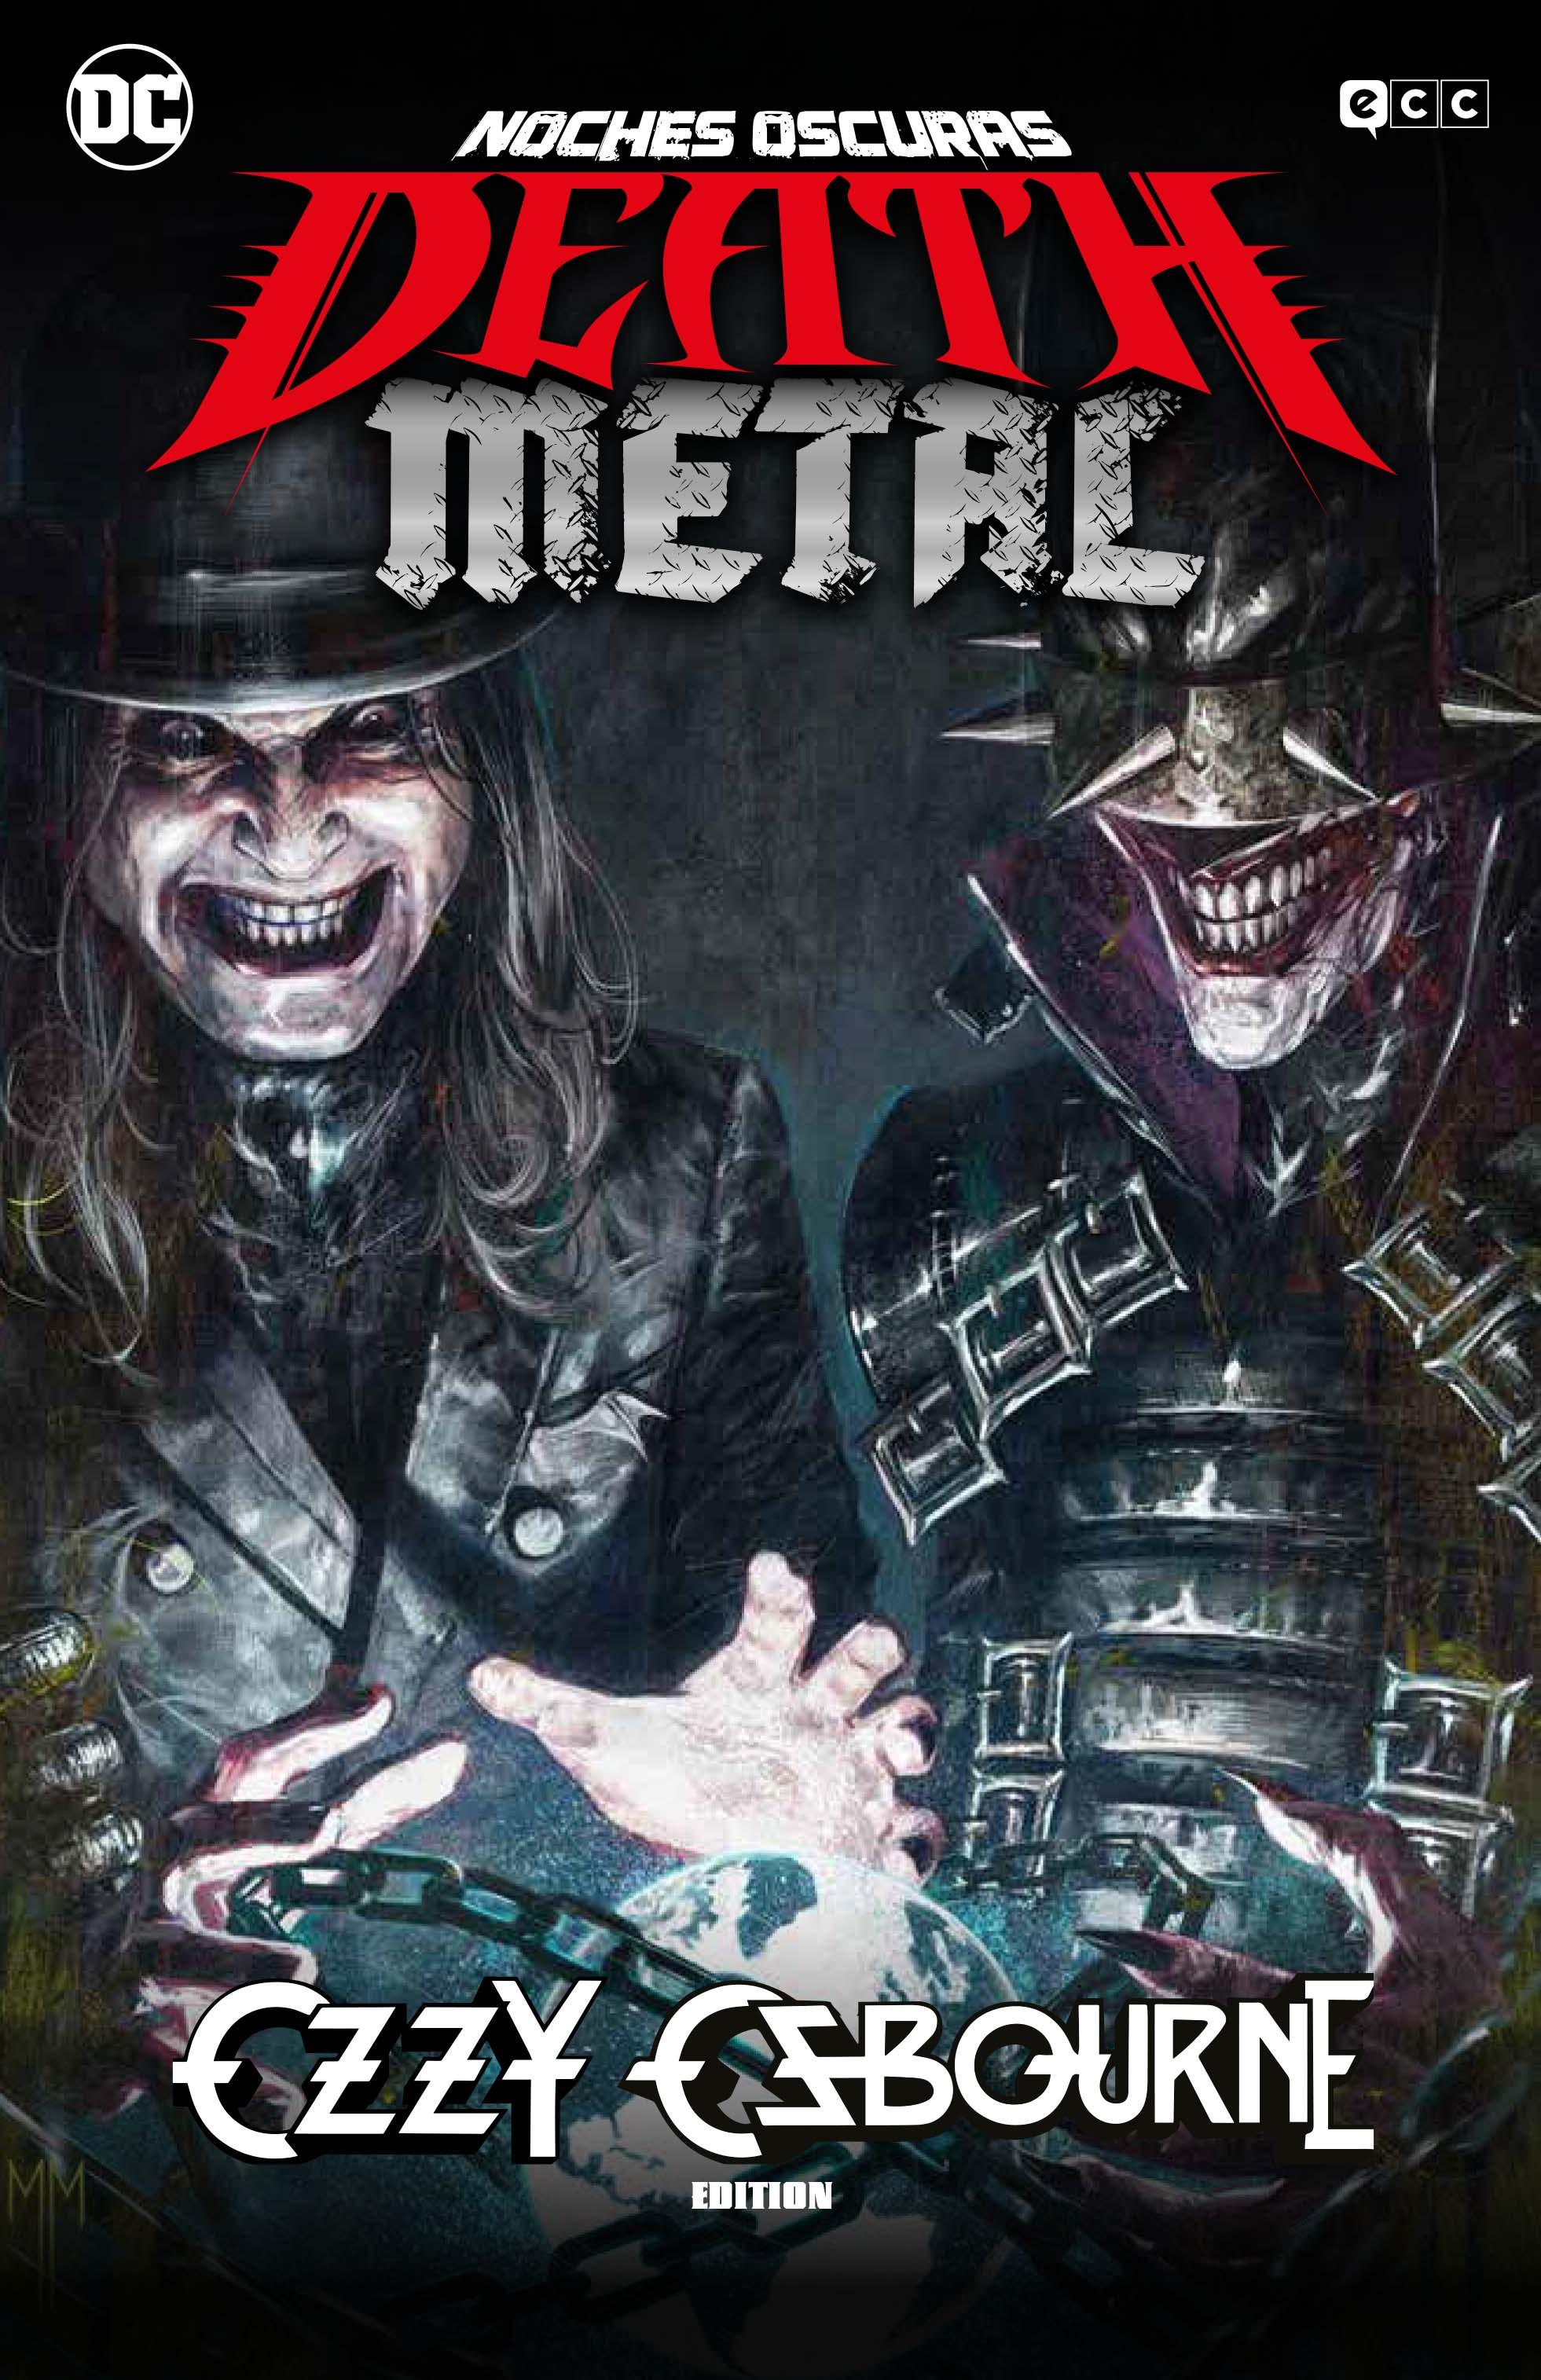 CARTONE Noches oscuras: Death Metal núm. 07 Band edition Ozzy Osbourne